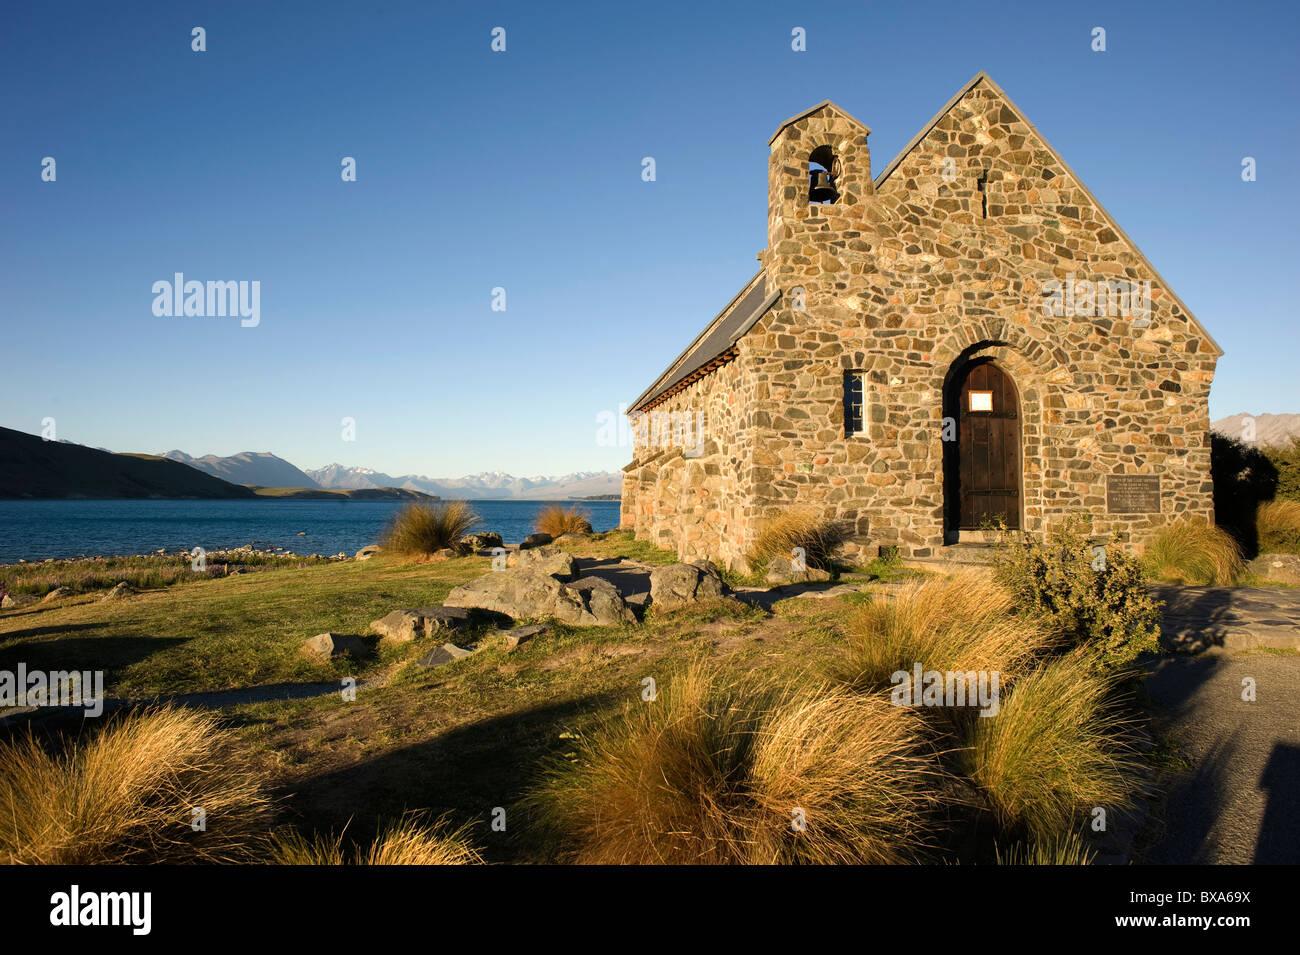 The evening sun catches the Church of the Good Shepherd on the shores of Lake Tekapo, Tekapo, New Zealand. - Stock Image